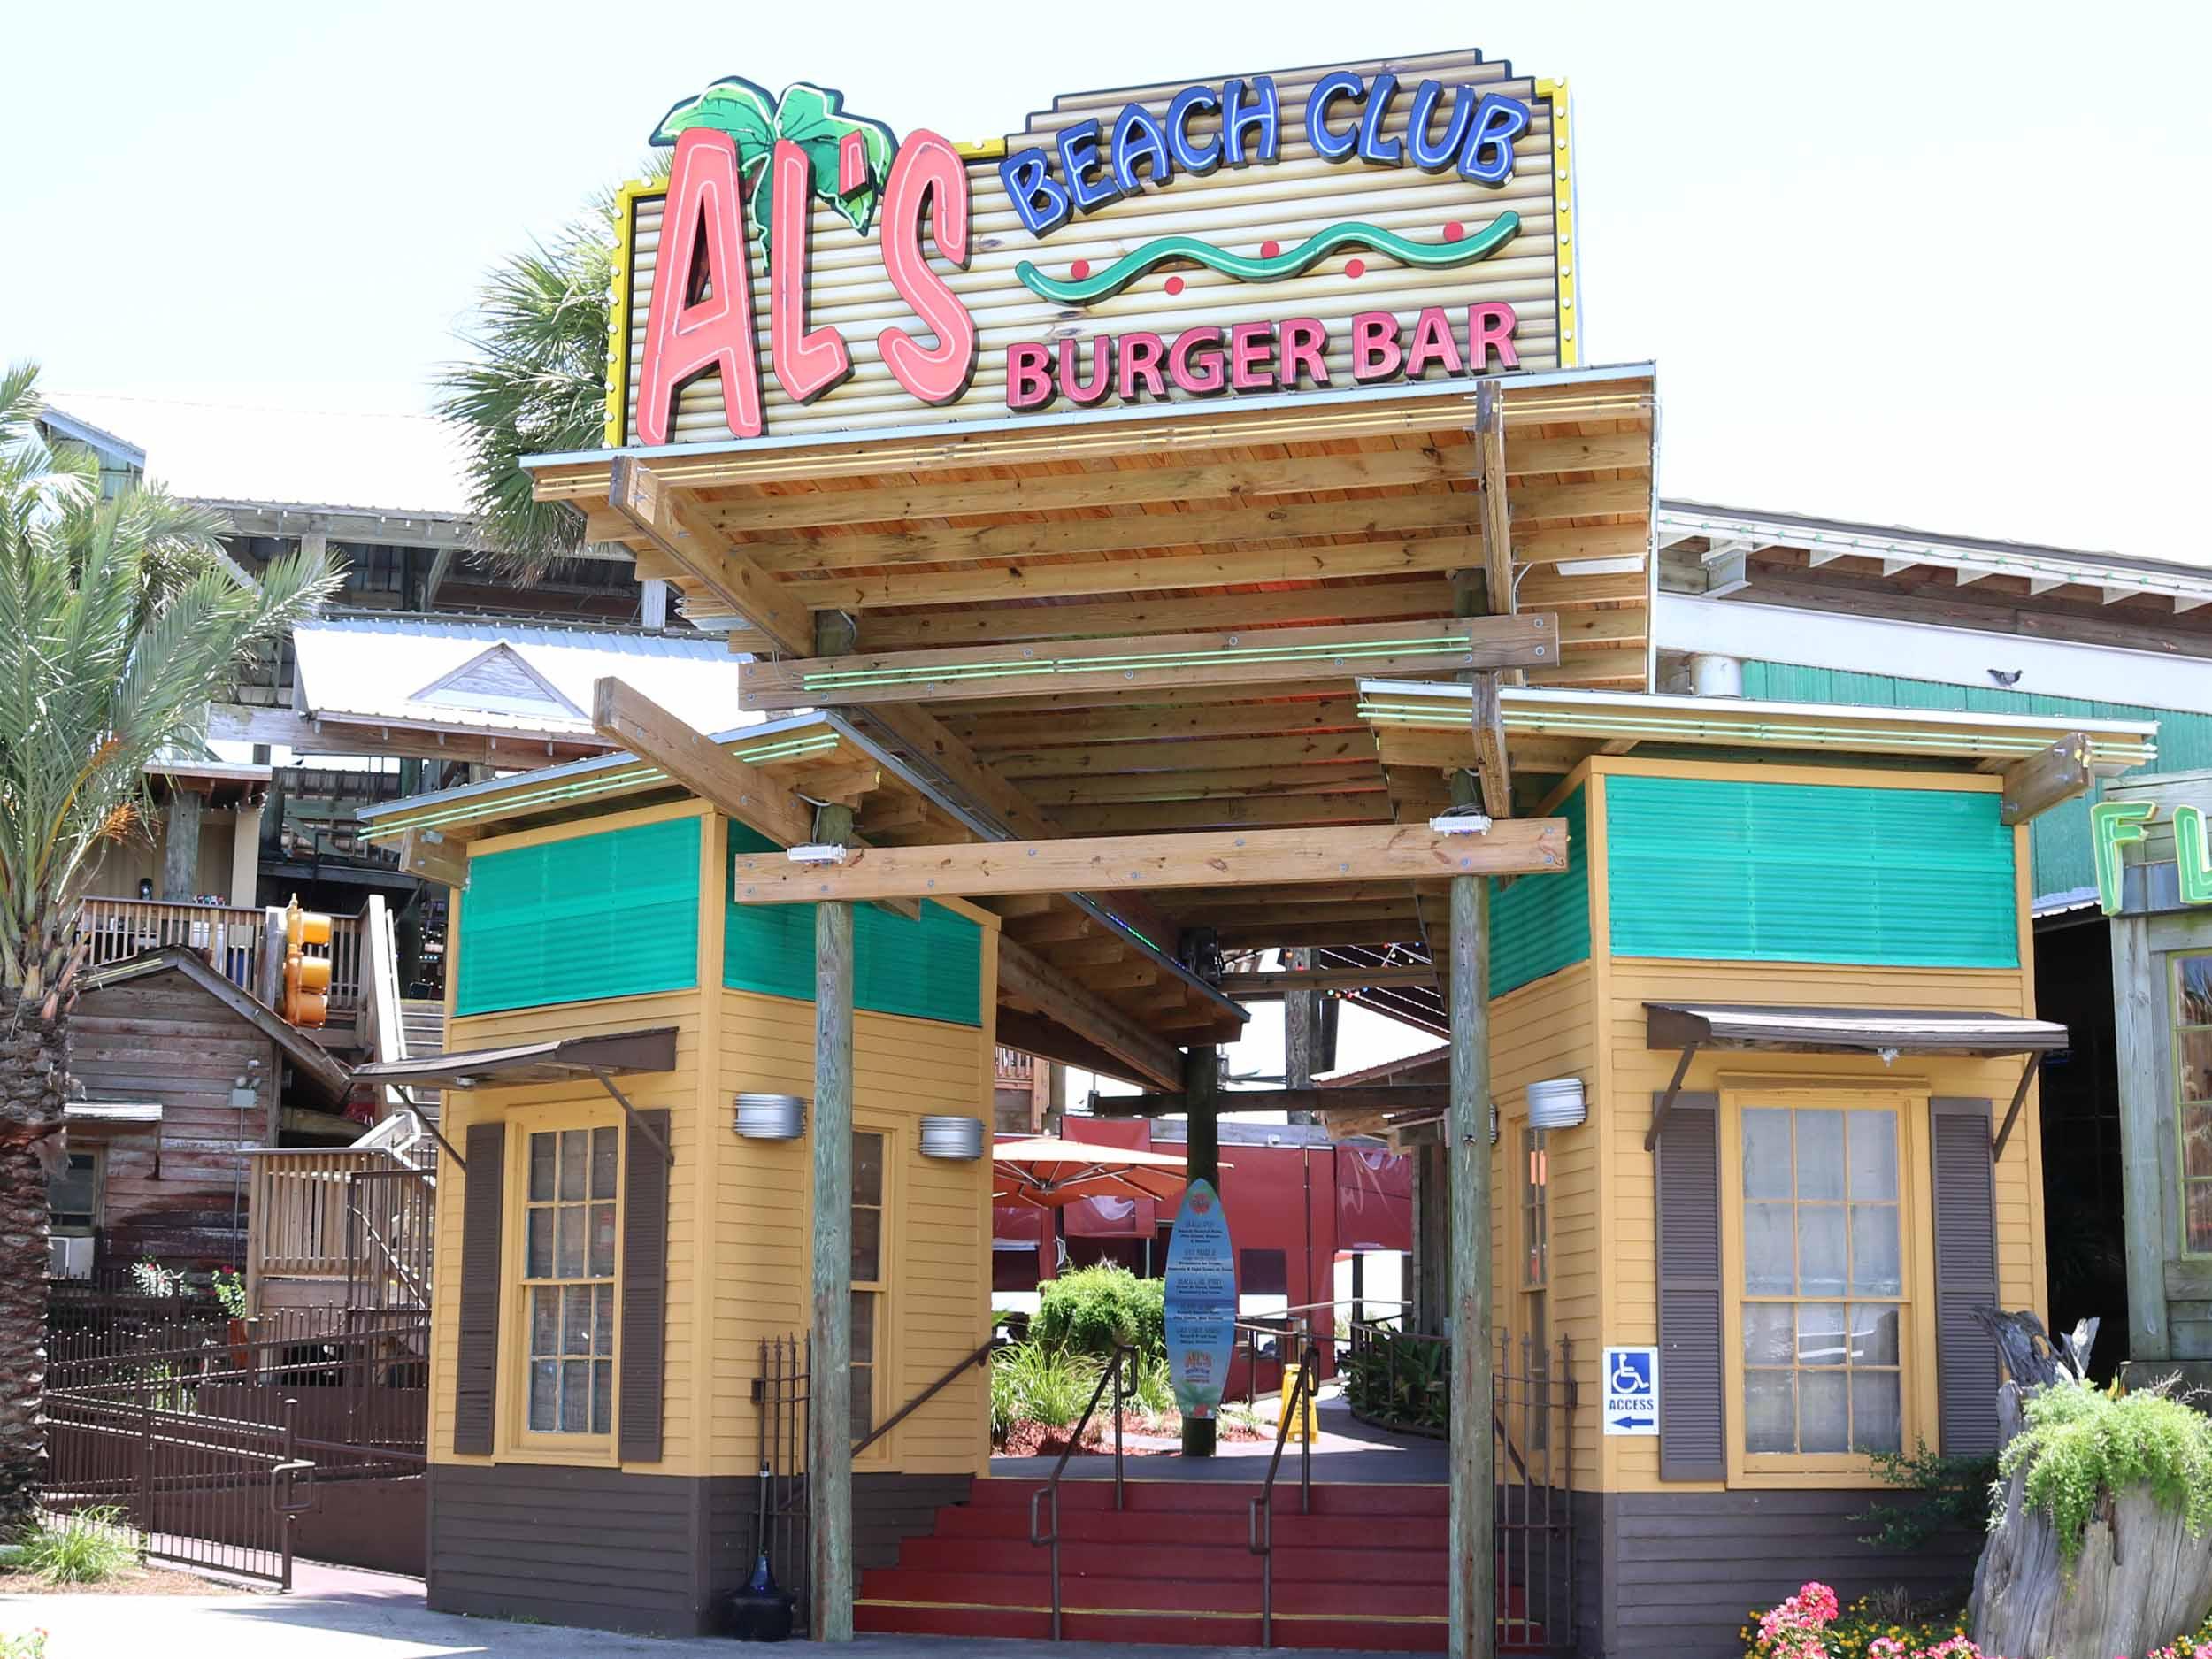 Al's Beach Club and Burger Bar Entrance